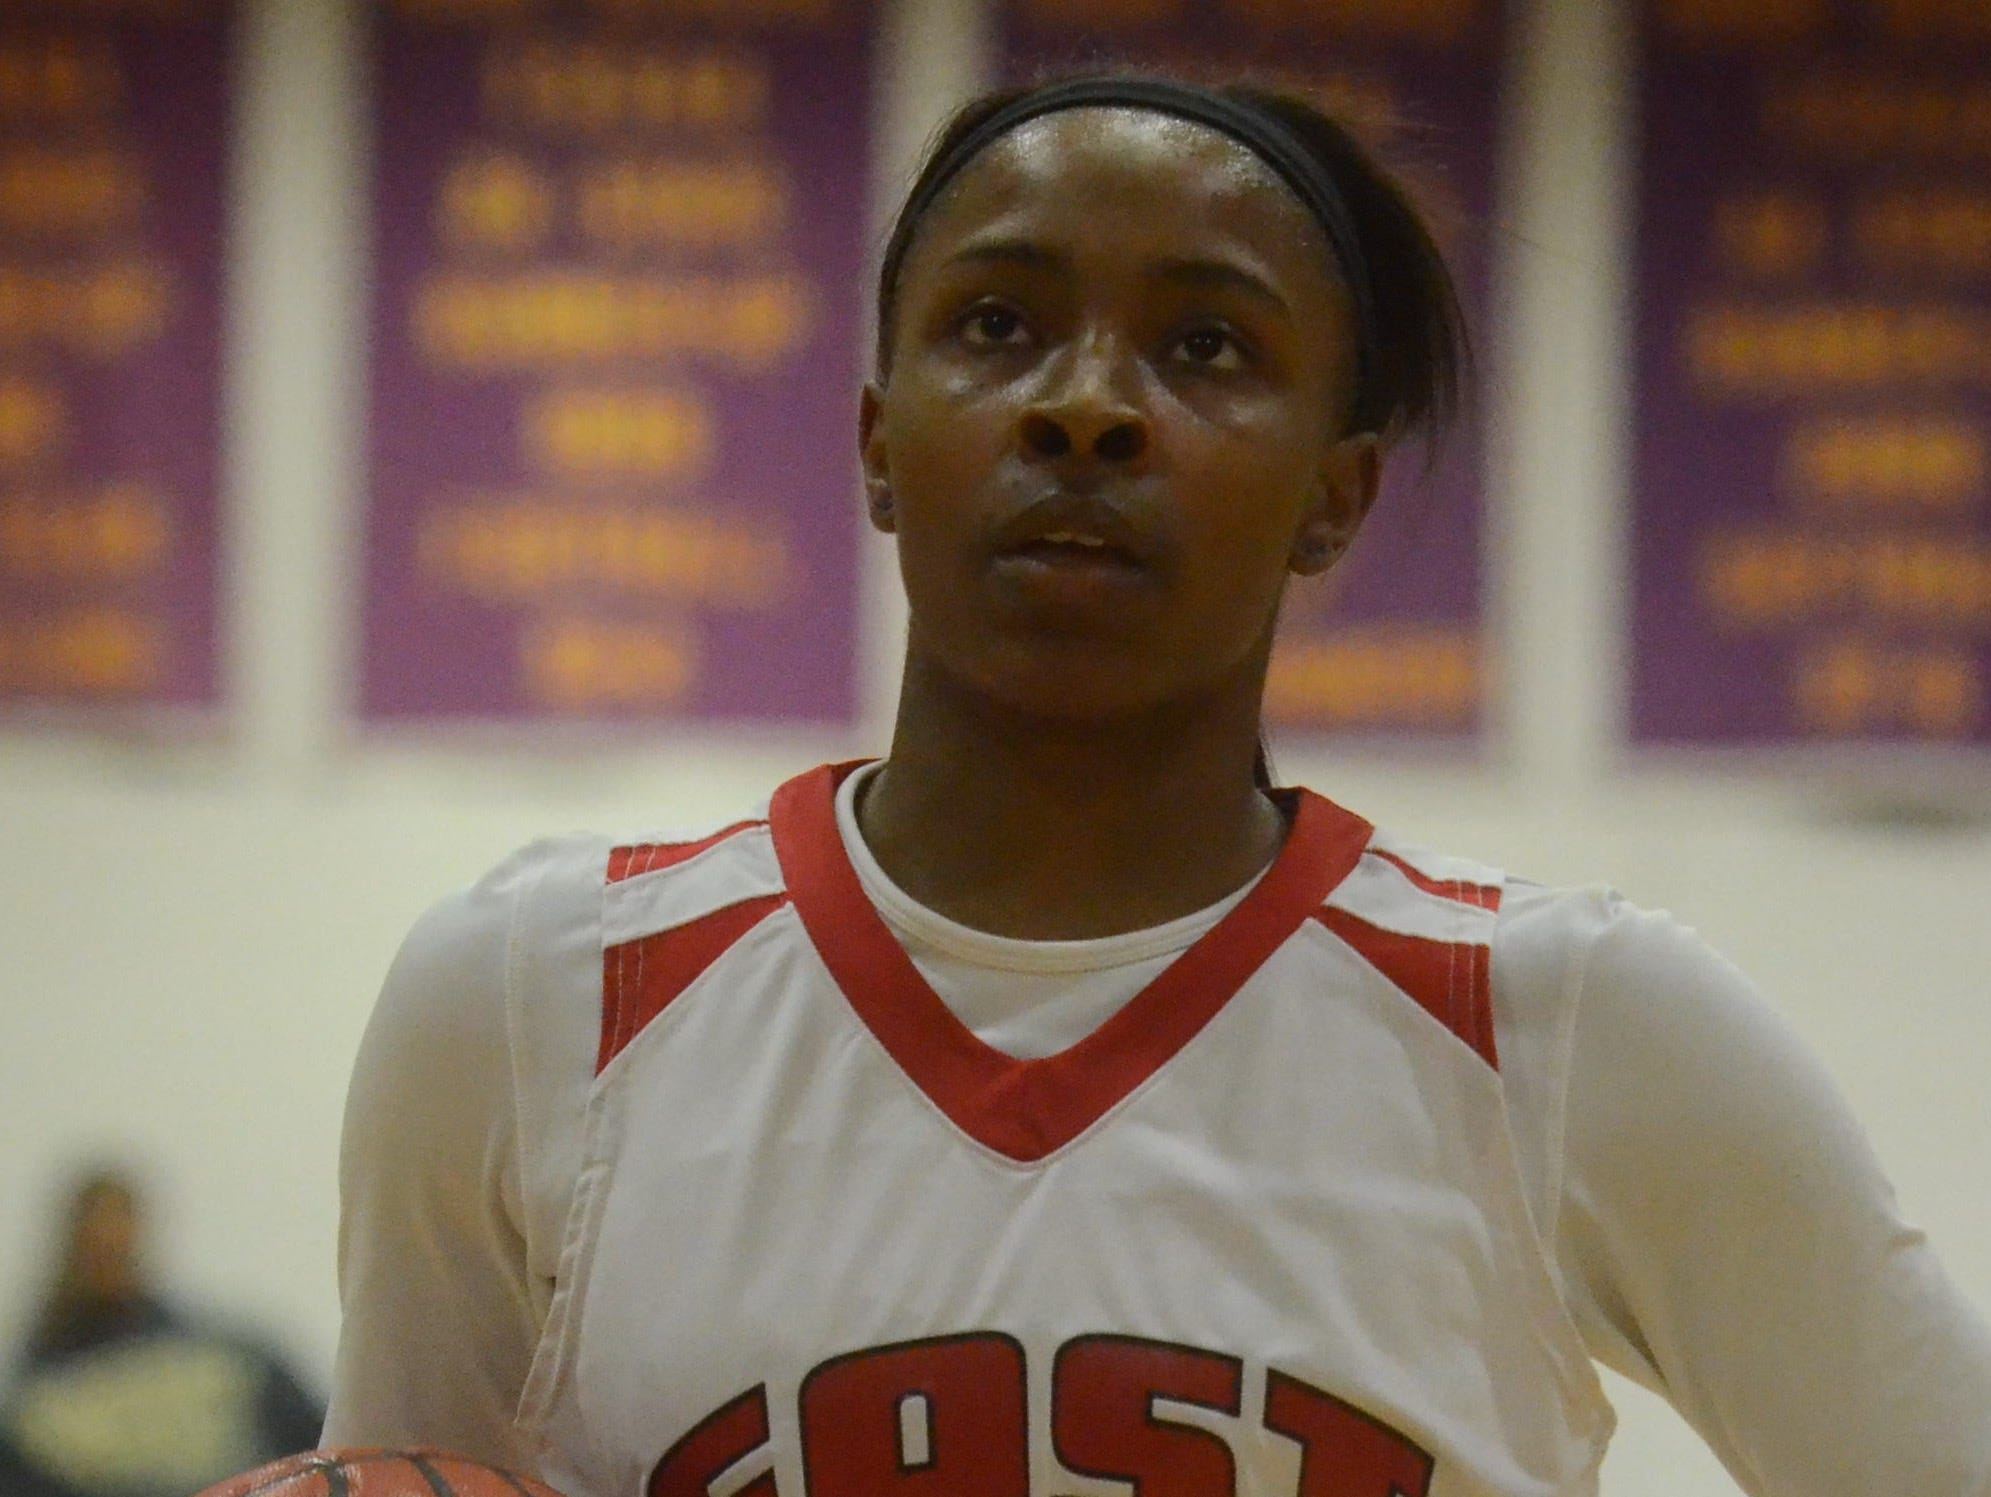 East Nashville junior Erica Haynes-Overton